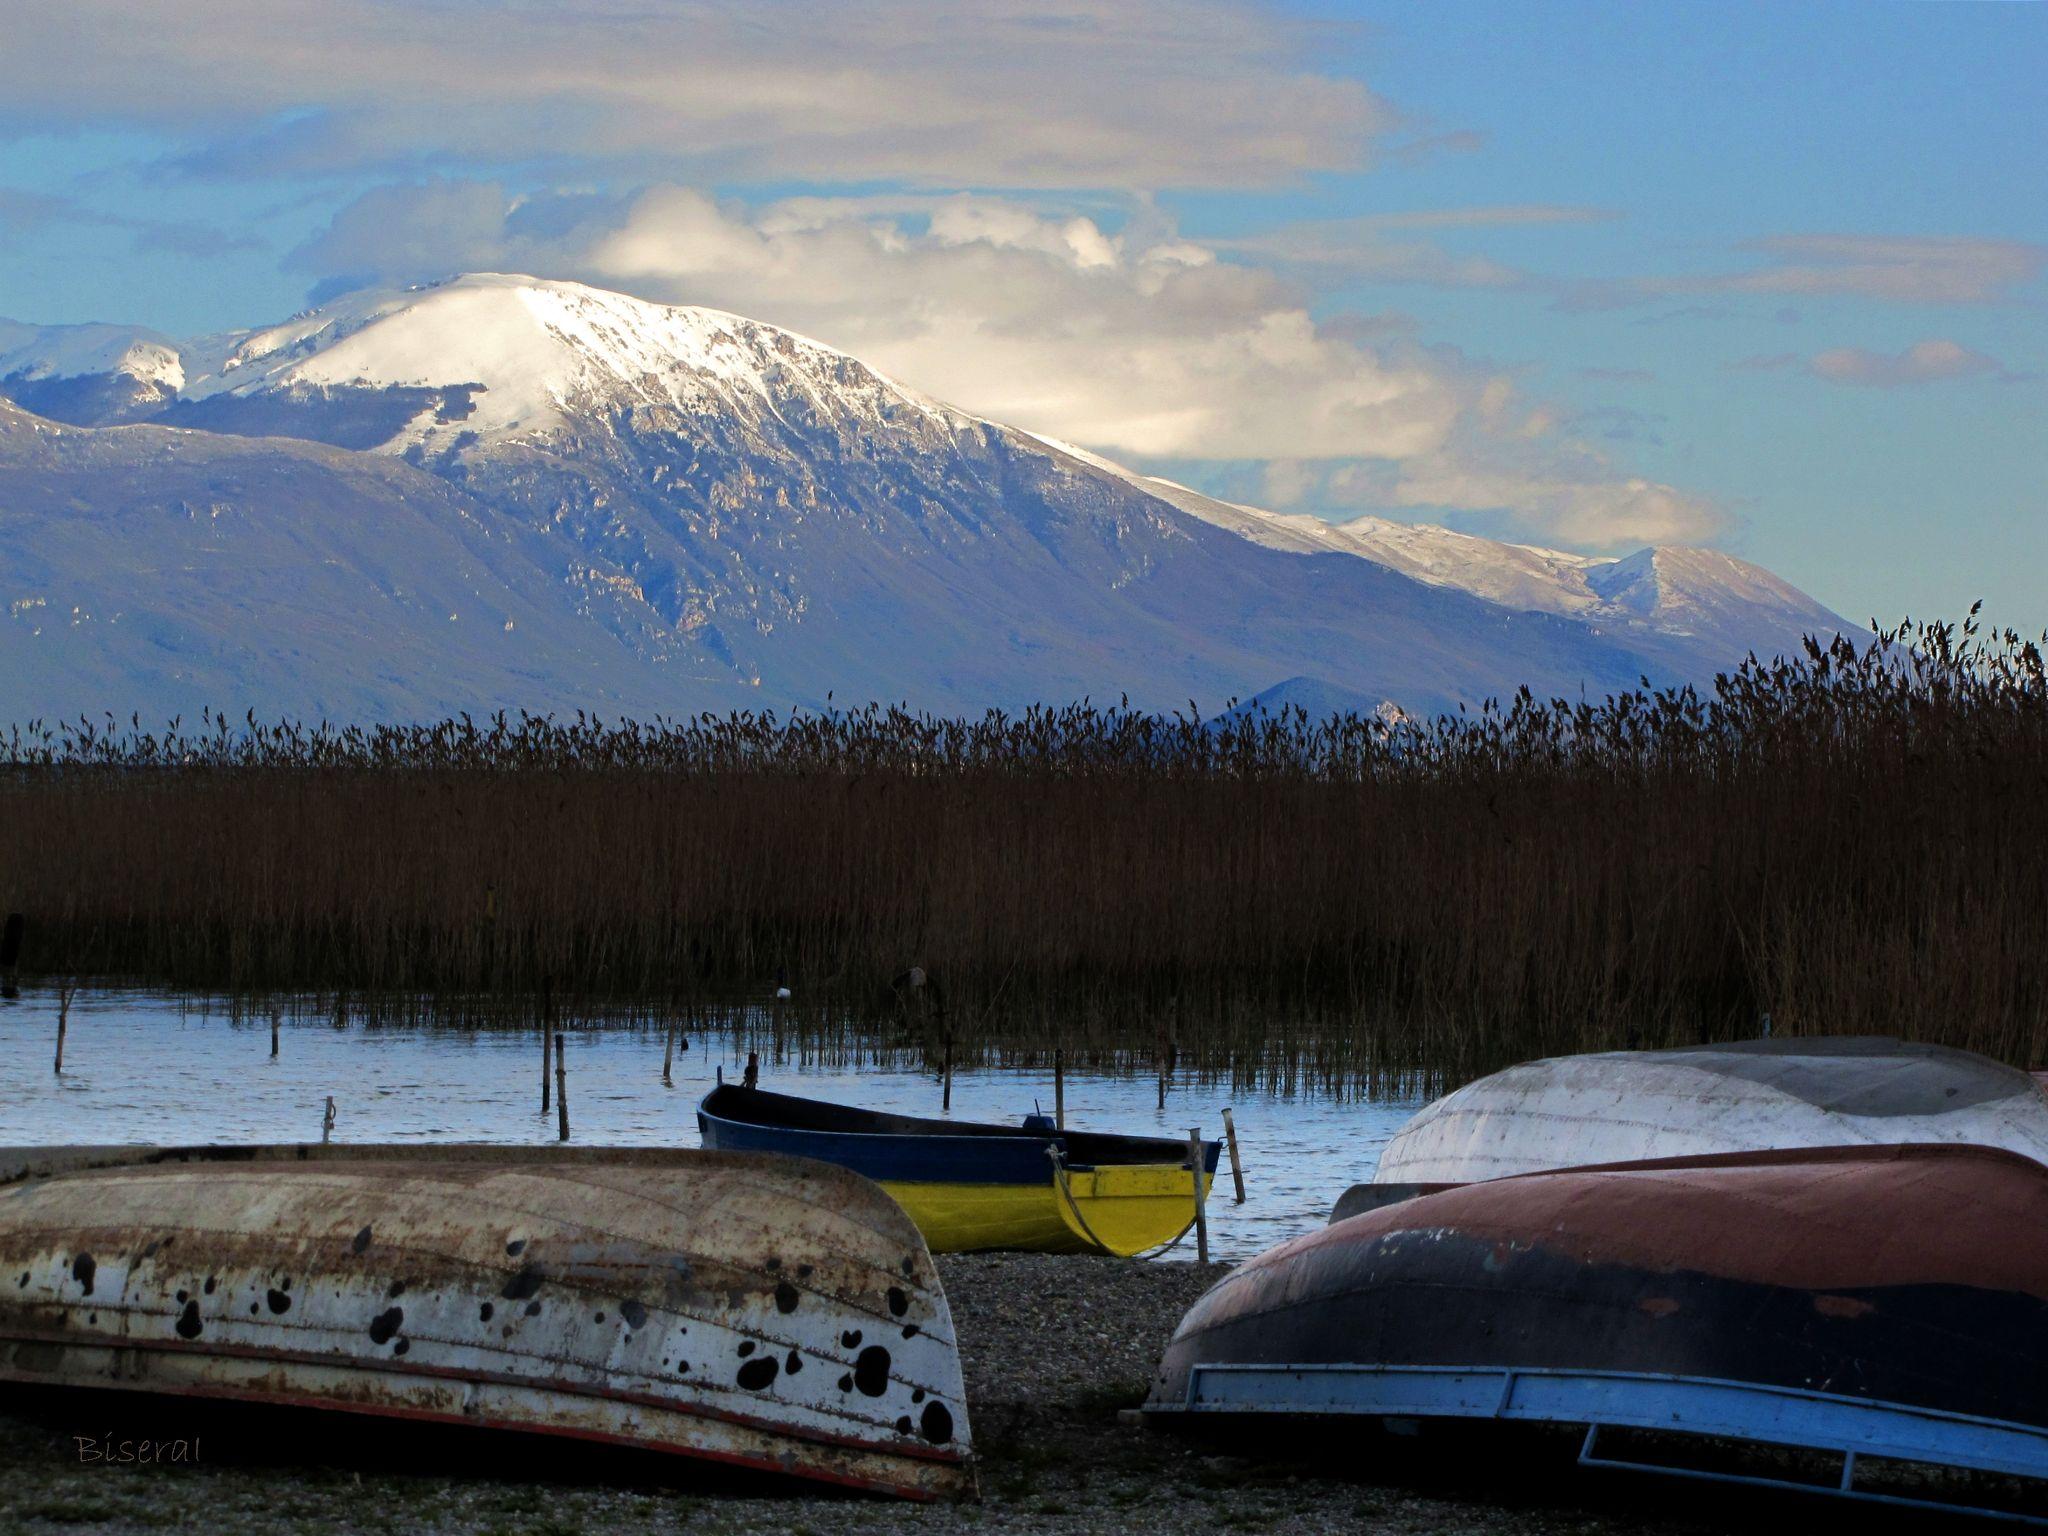 Galičica Mountain by BiseraI